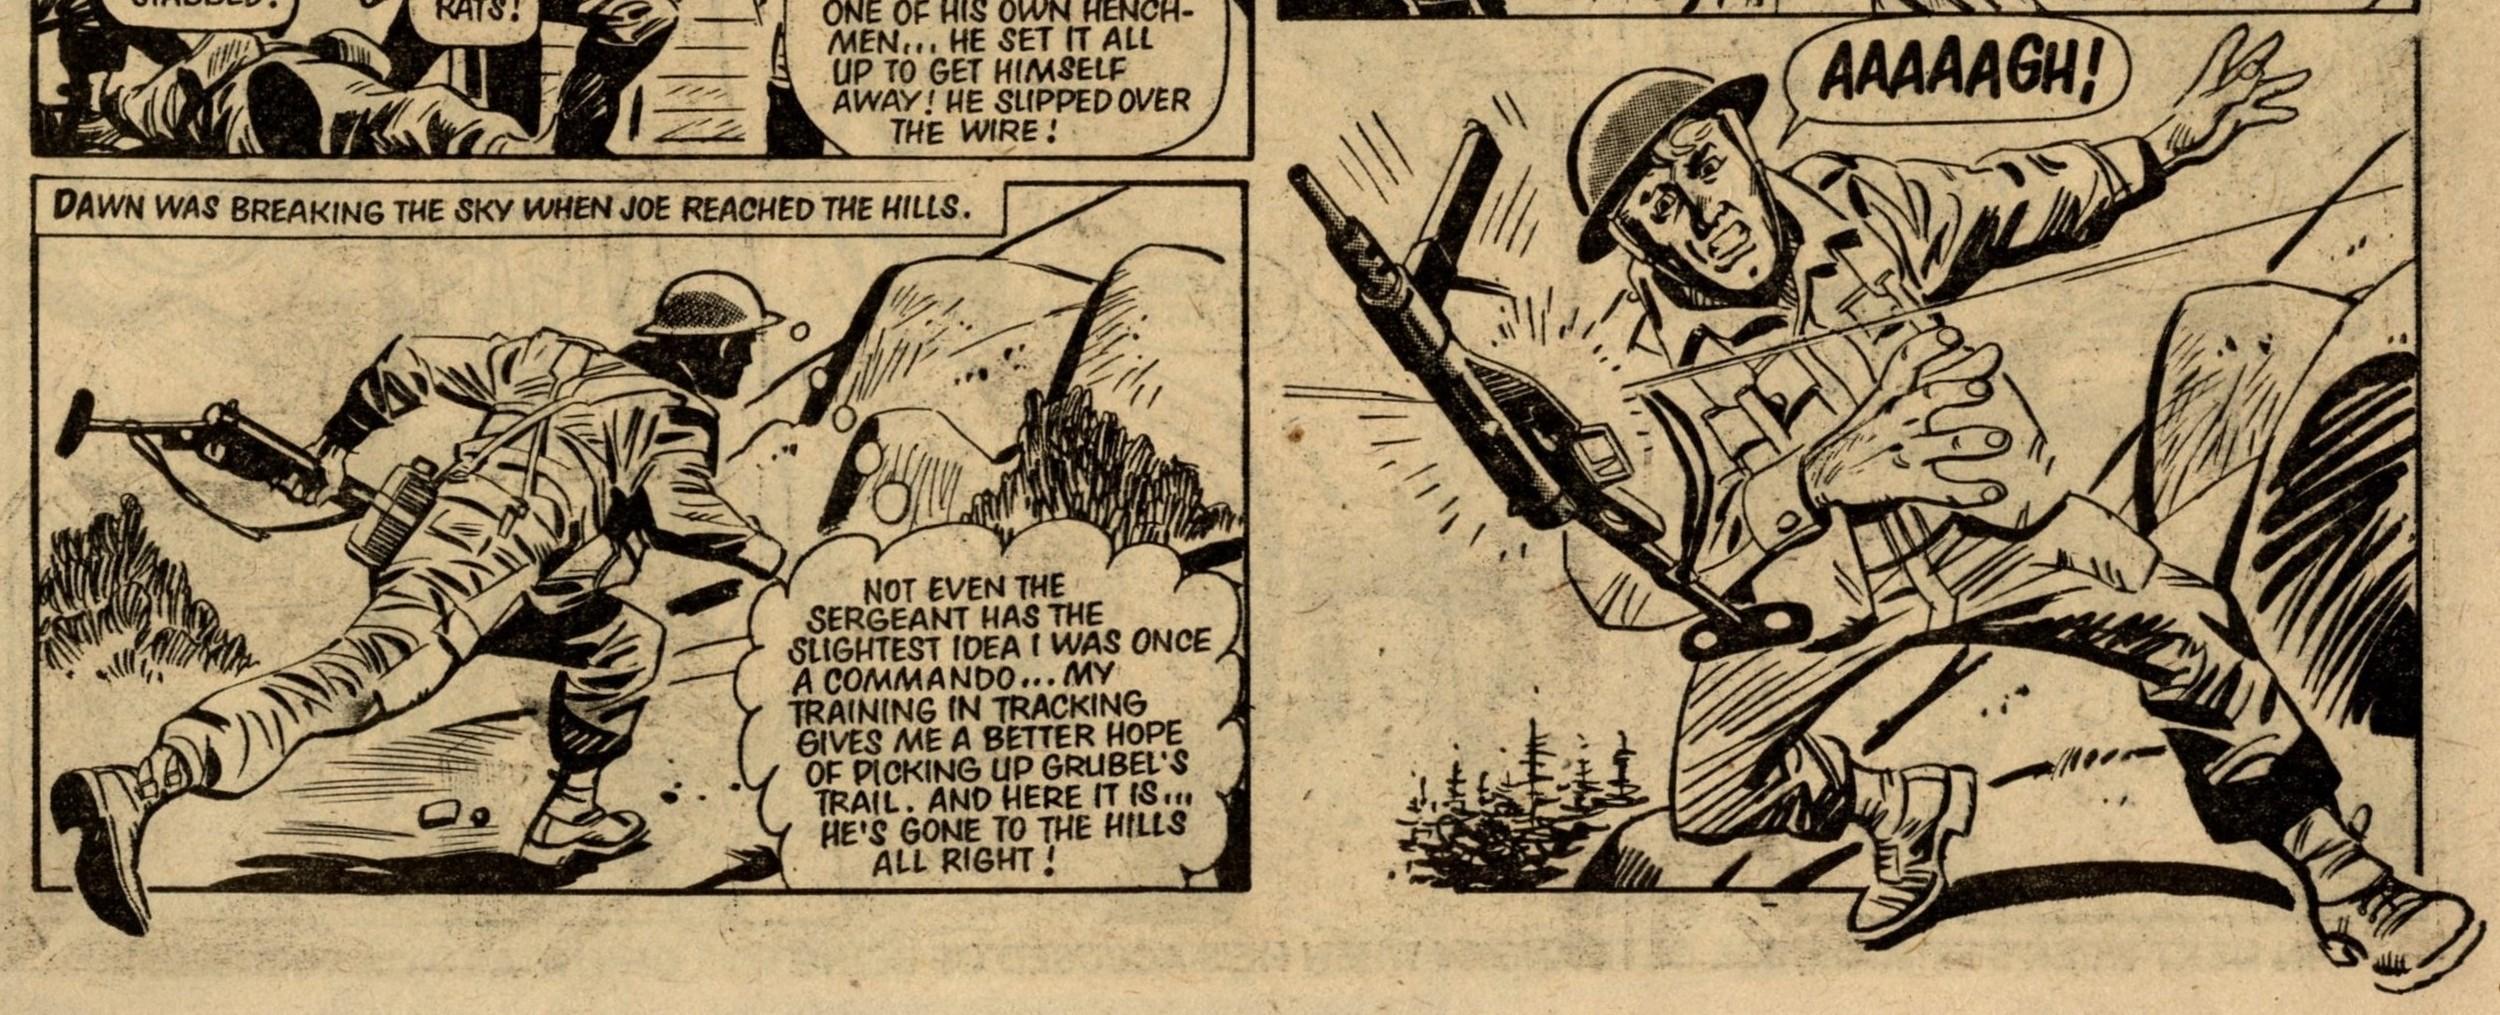 The Commando They Didn't Want: John Richard (writer), Carlos Pino (artist)